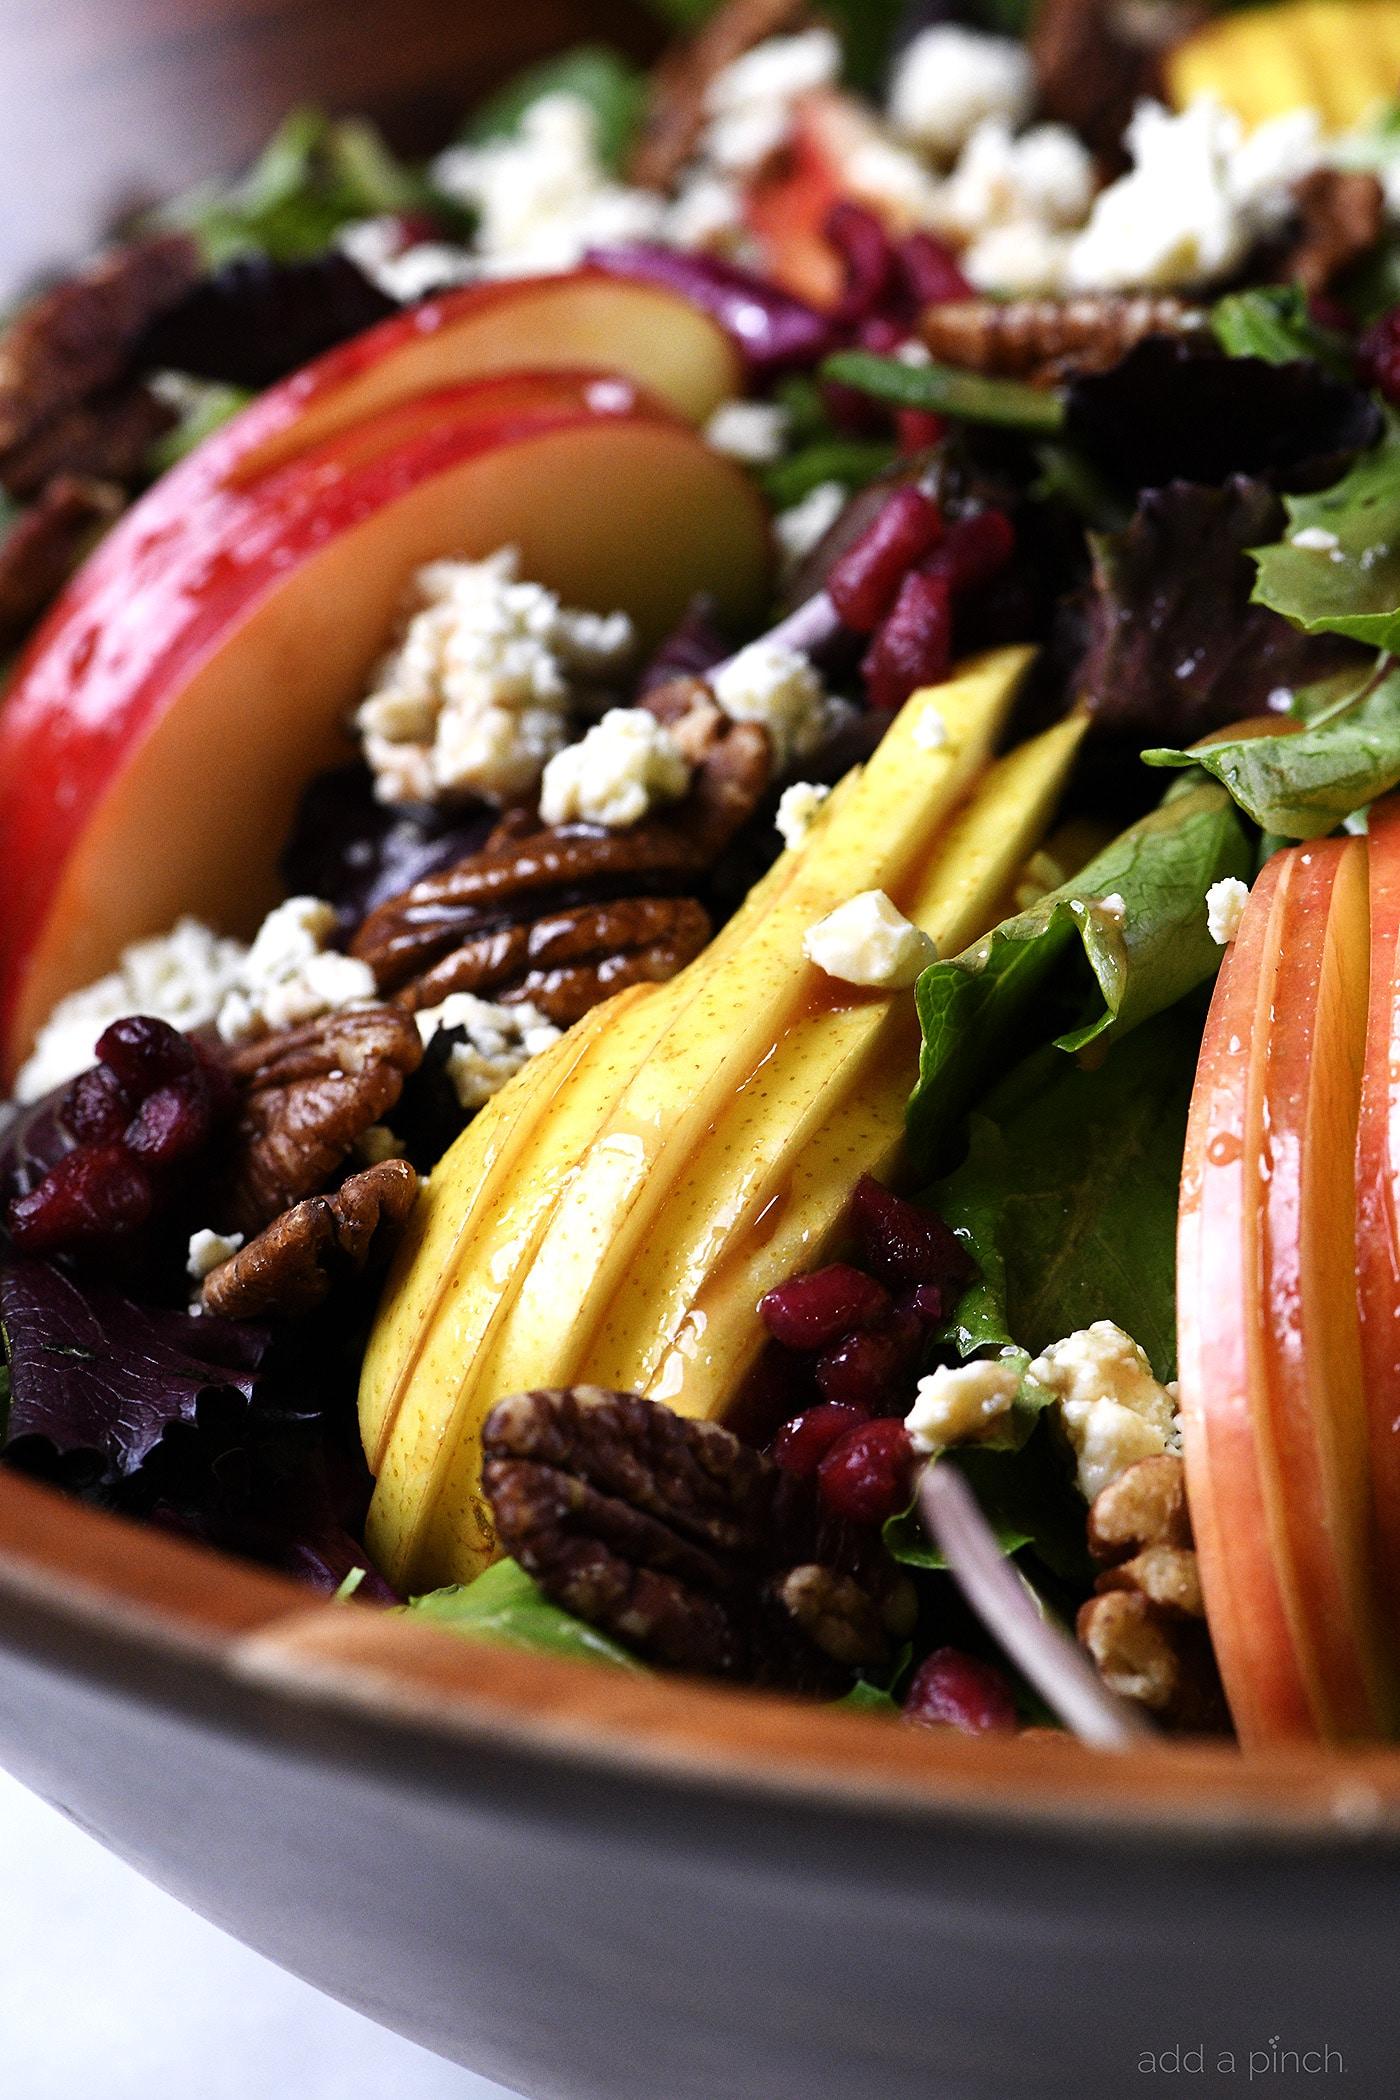 Apple Pear Salad With Pomegranate Vinaigrette